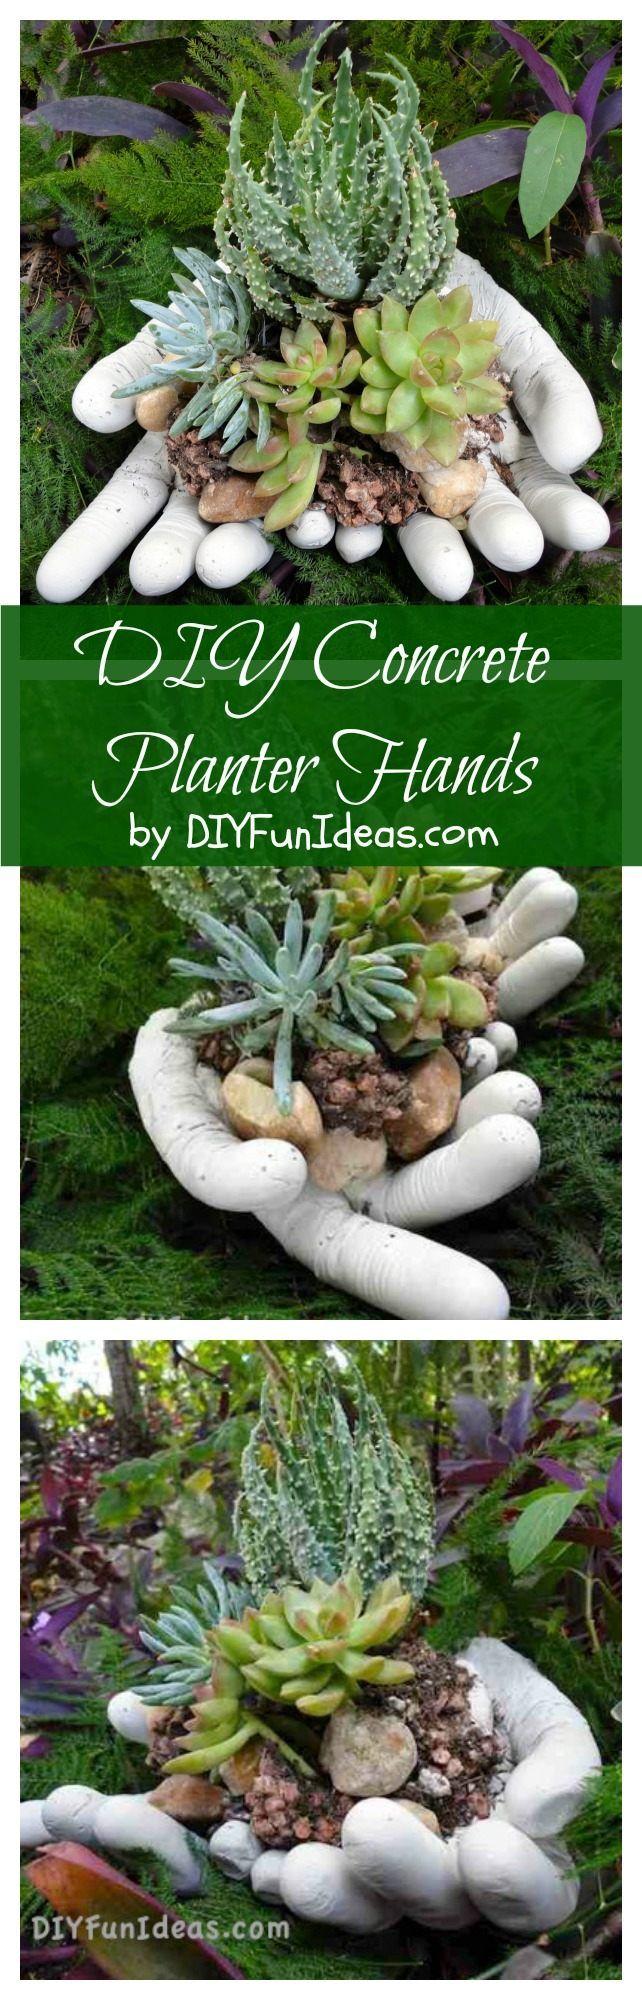 DIY concrete planter hands